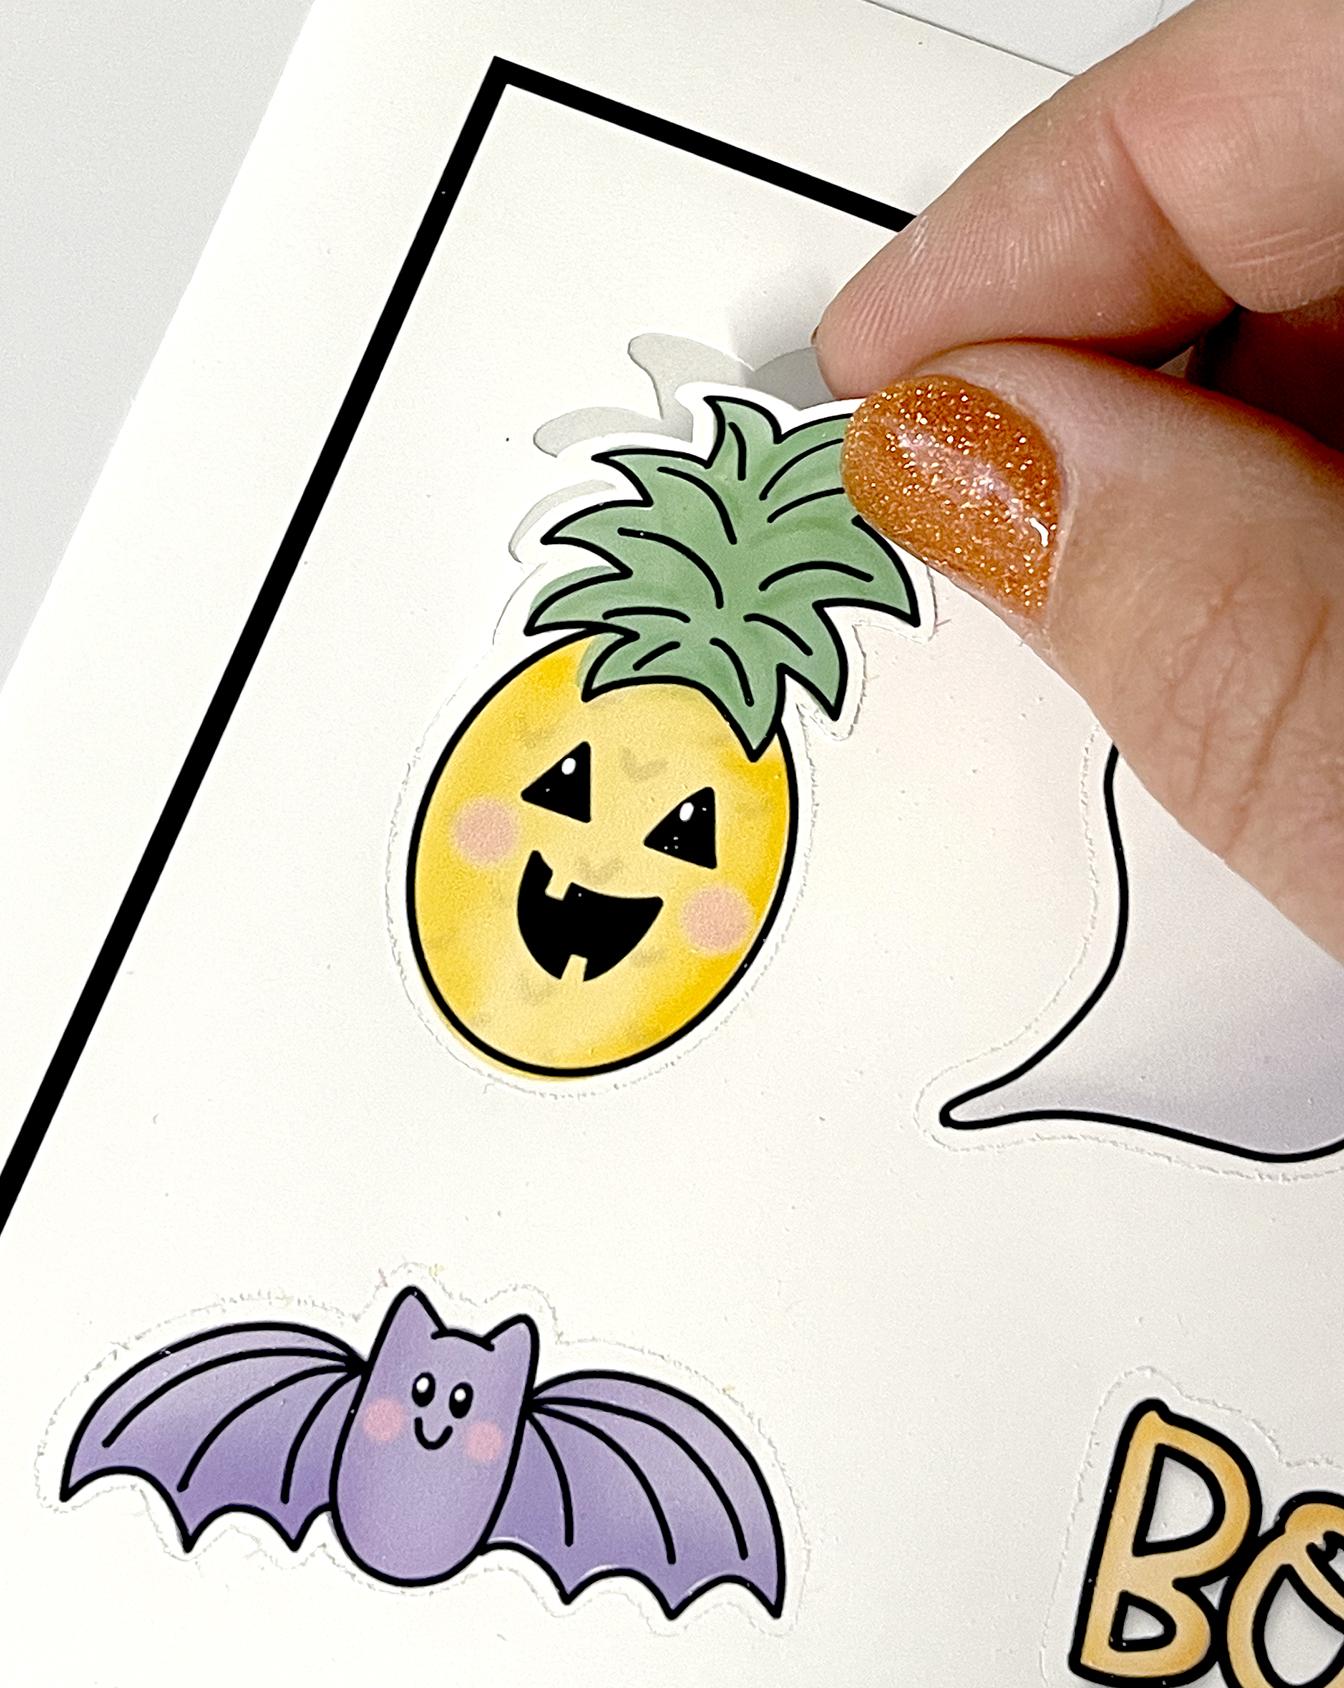 Fingers Peel Pineapple Halloween Jack o Lantern Sticker from Cricut Print then Cut Page